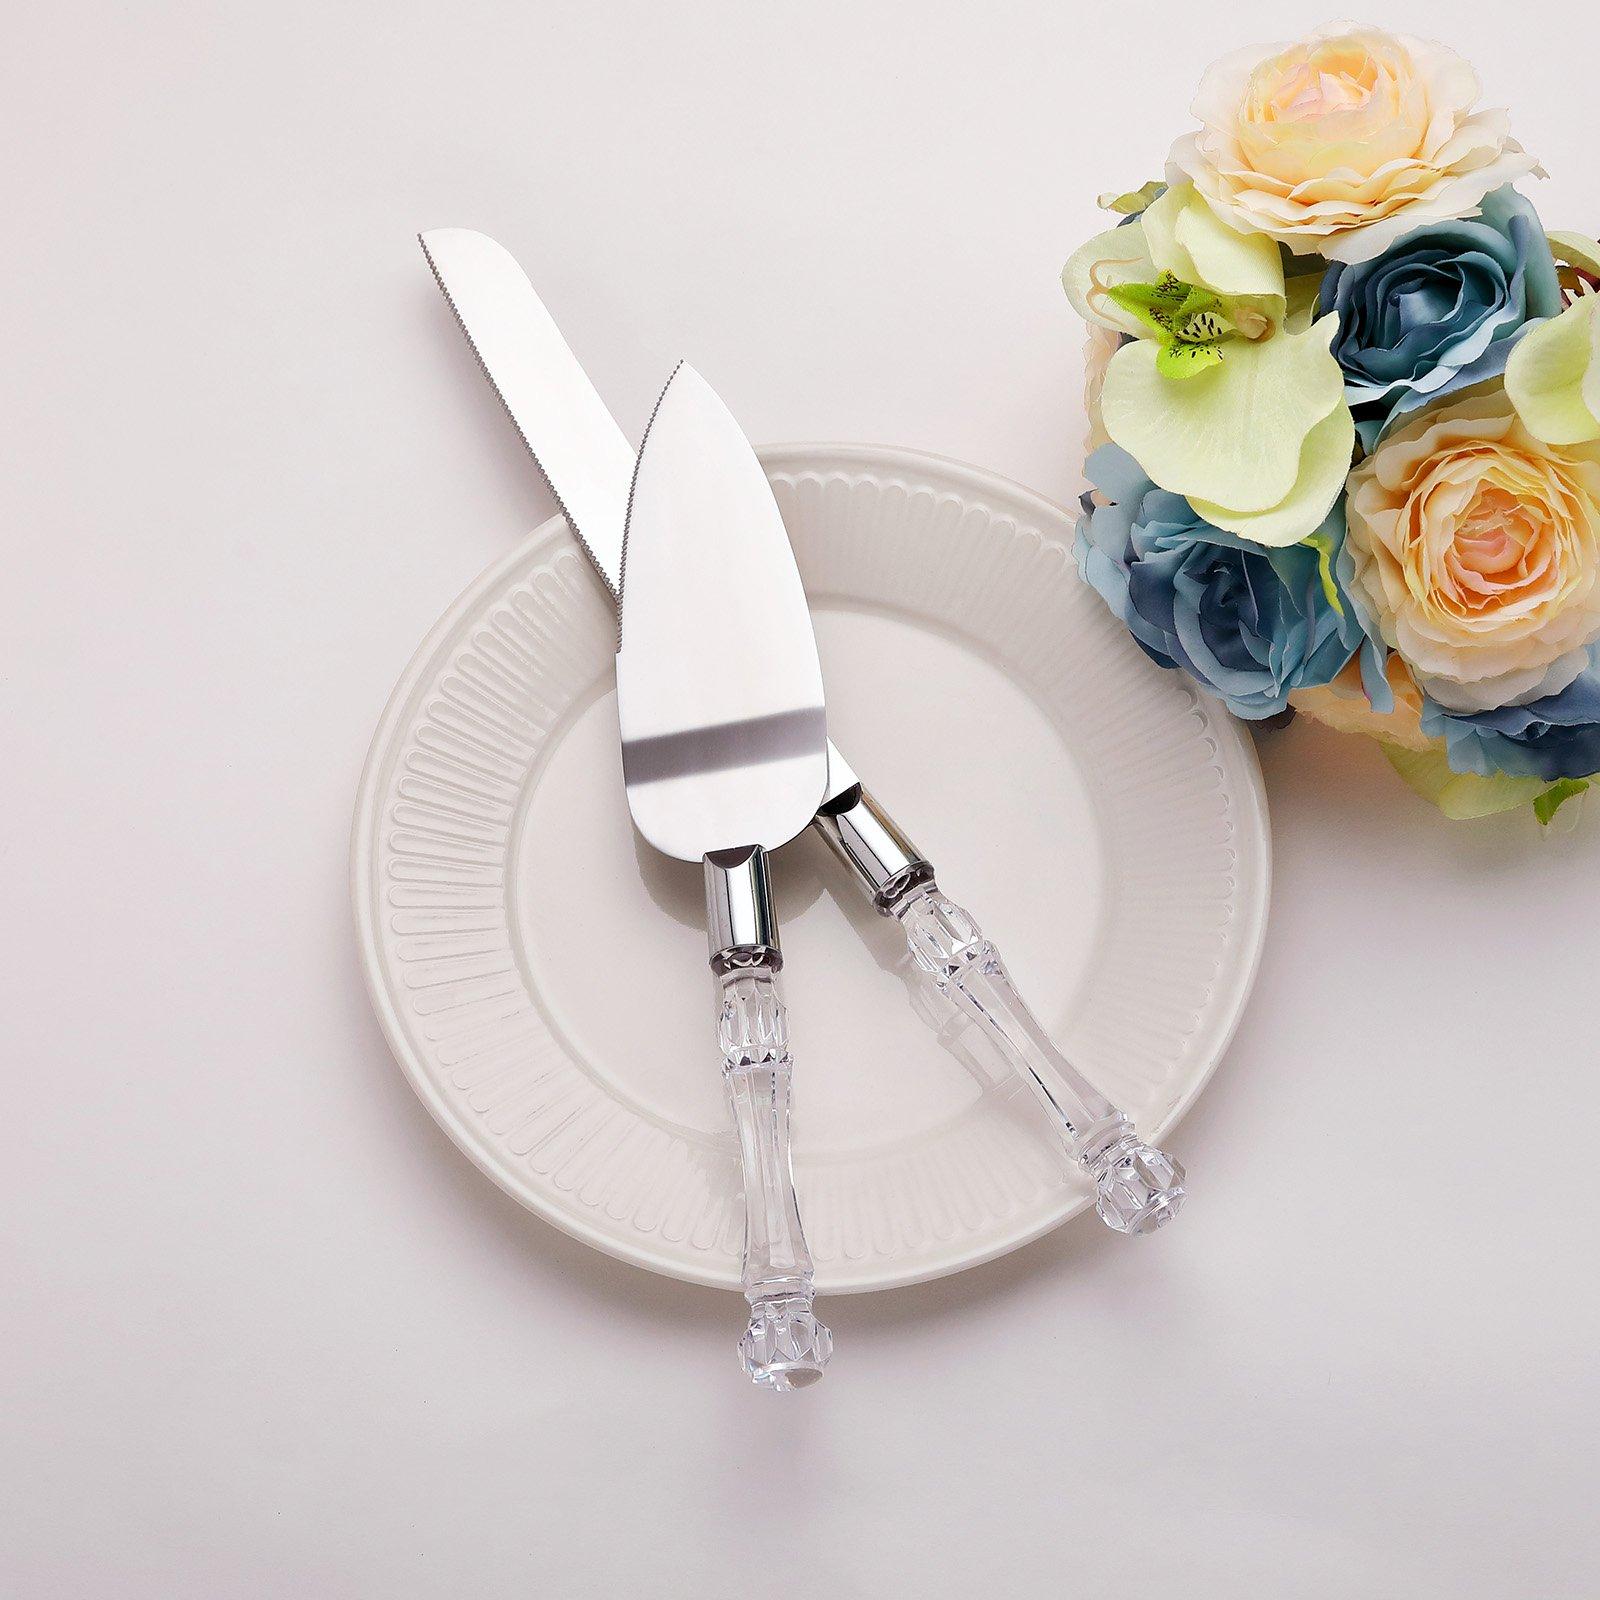 AW BRIDAL Wedding Cake Knife and Server Set - Cake Knife 13.2 Inch, Cake Server 10.8 inch - Gifts for Bridal Shower, Wedding, Anniversary, Birthday, Housewarming